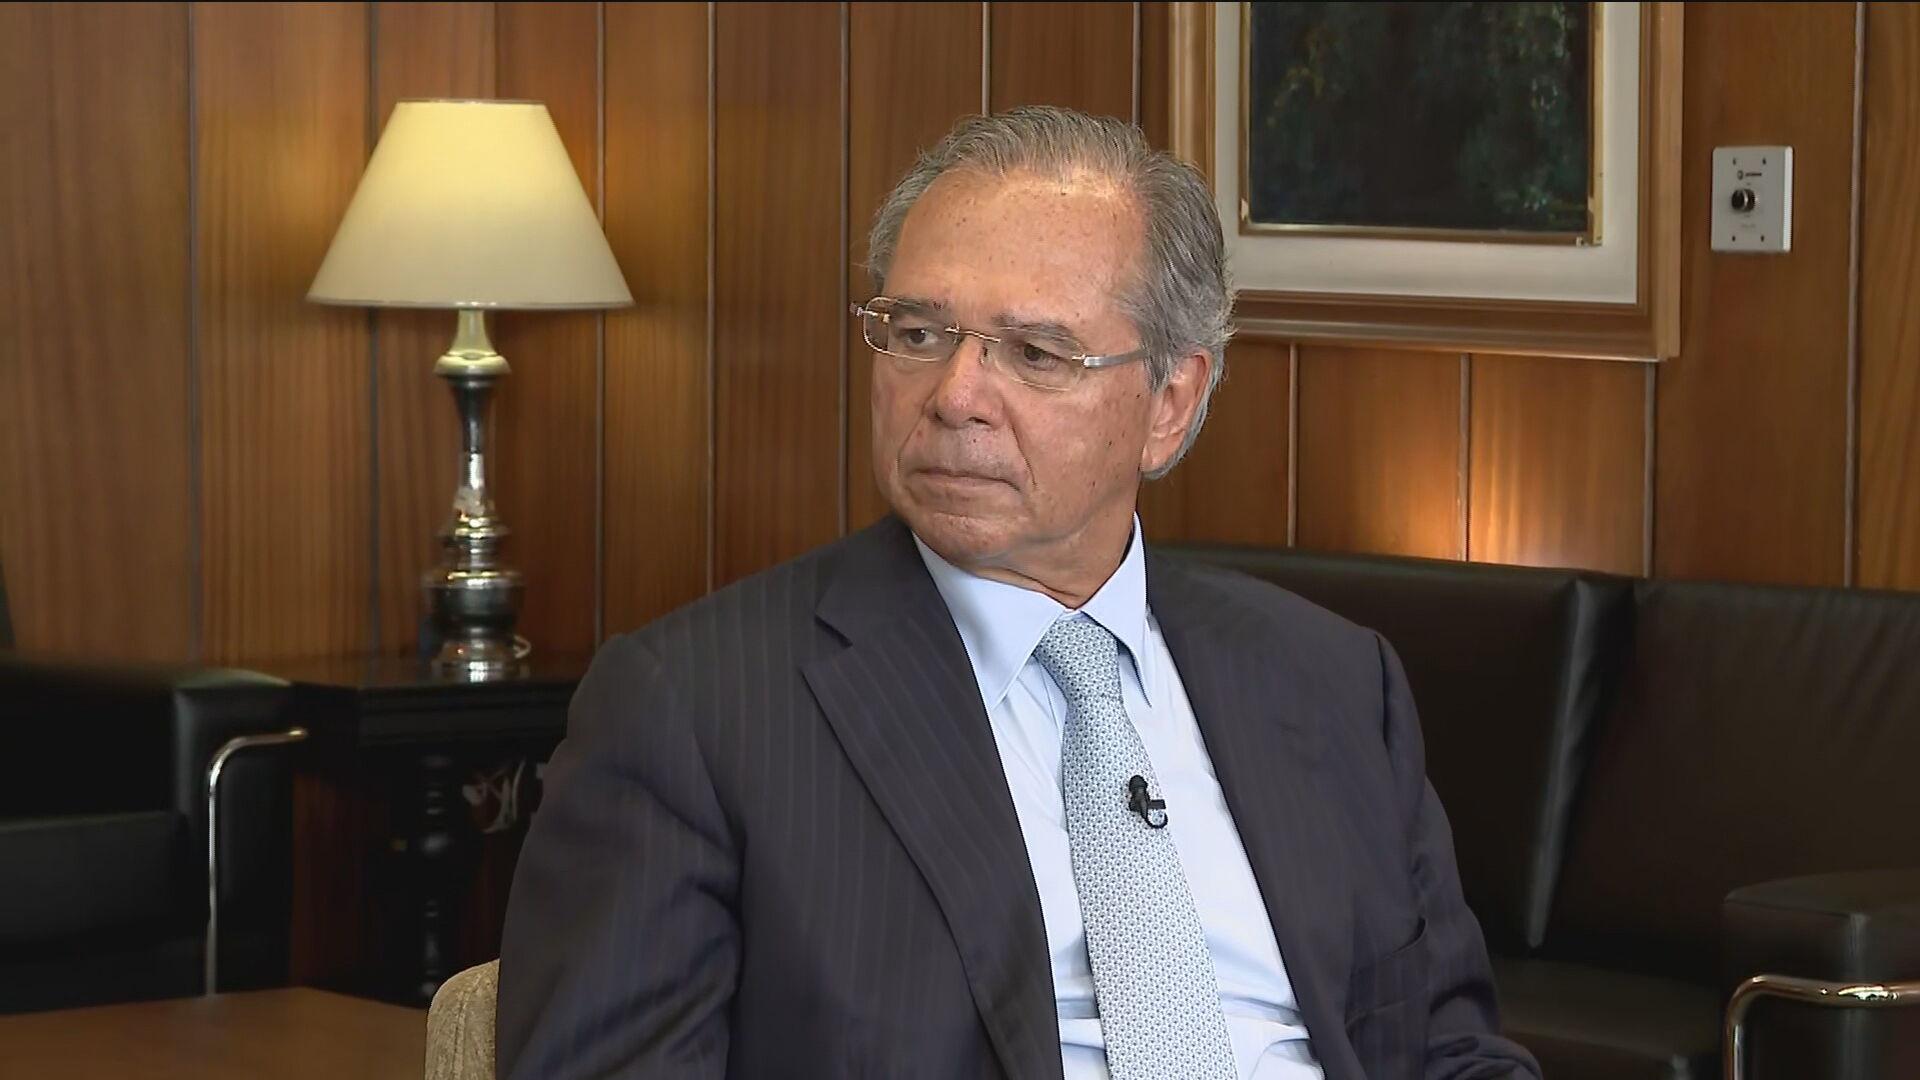 Paulo Guedes em entrevista exclusiva à CNN Brasil